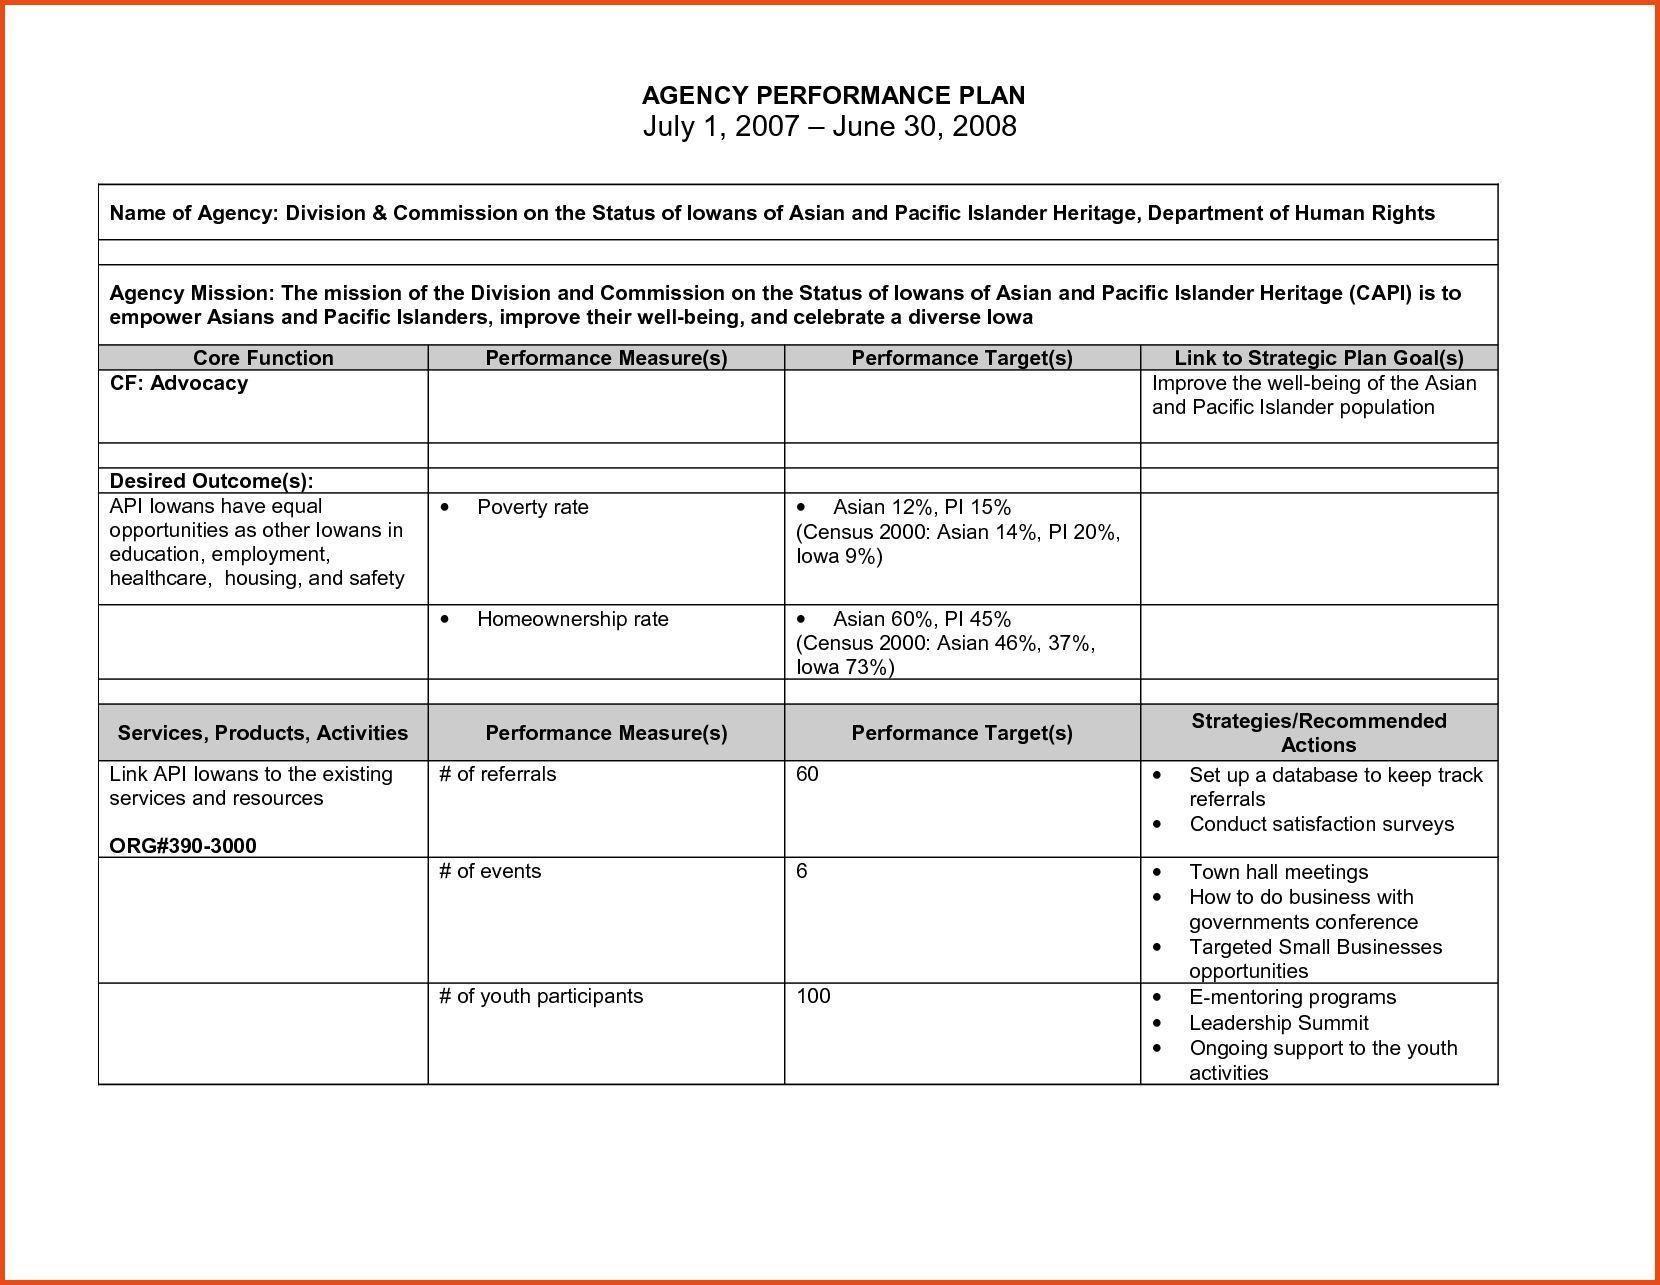 013 Performance Improvement Plan Template Striking Ideas For In Performance Improvement Plan Templat Personal Improvement Plan Action Plan Template How To Plan